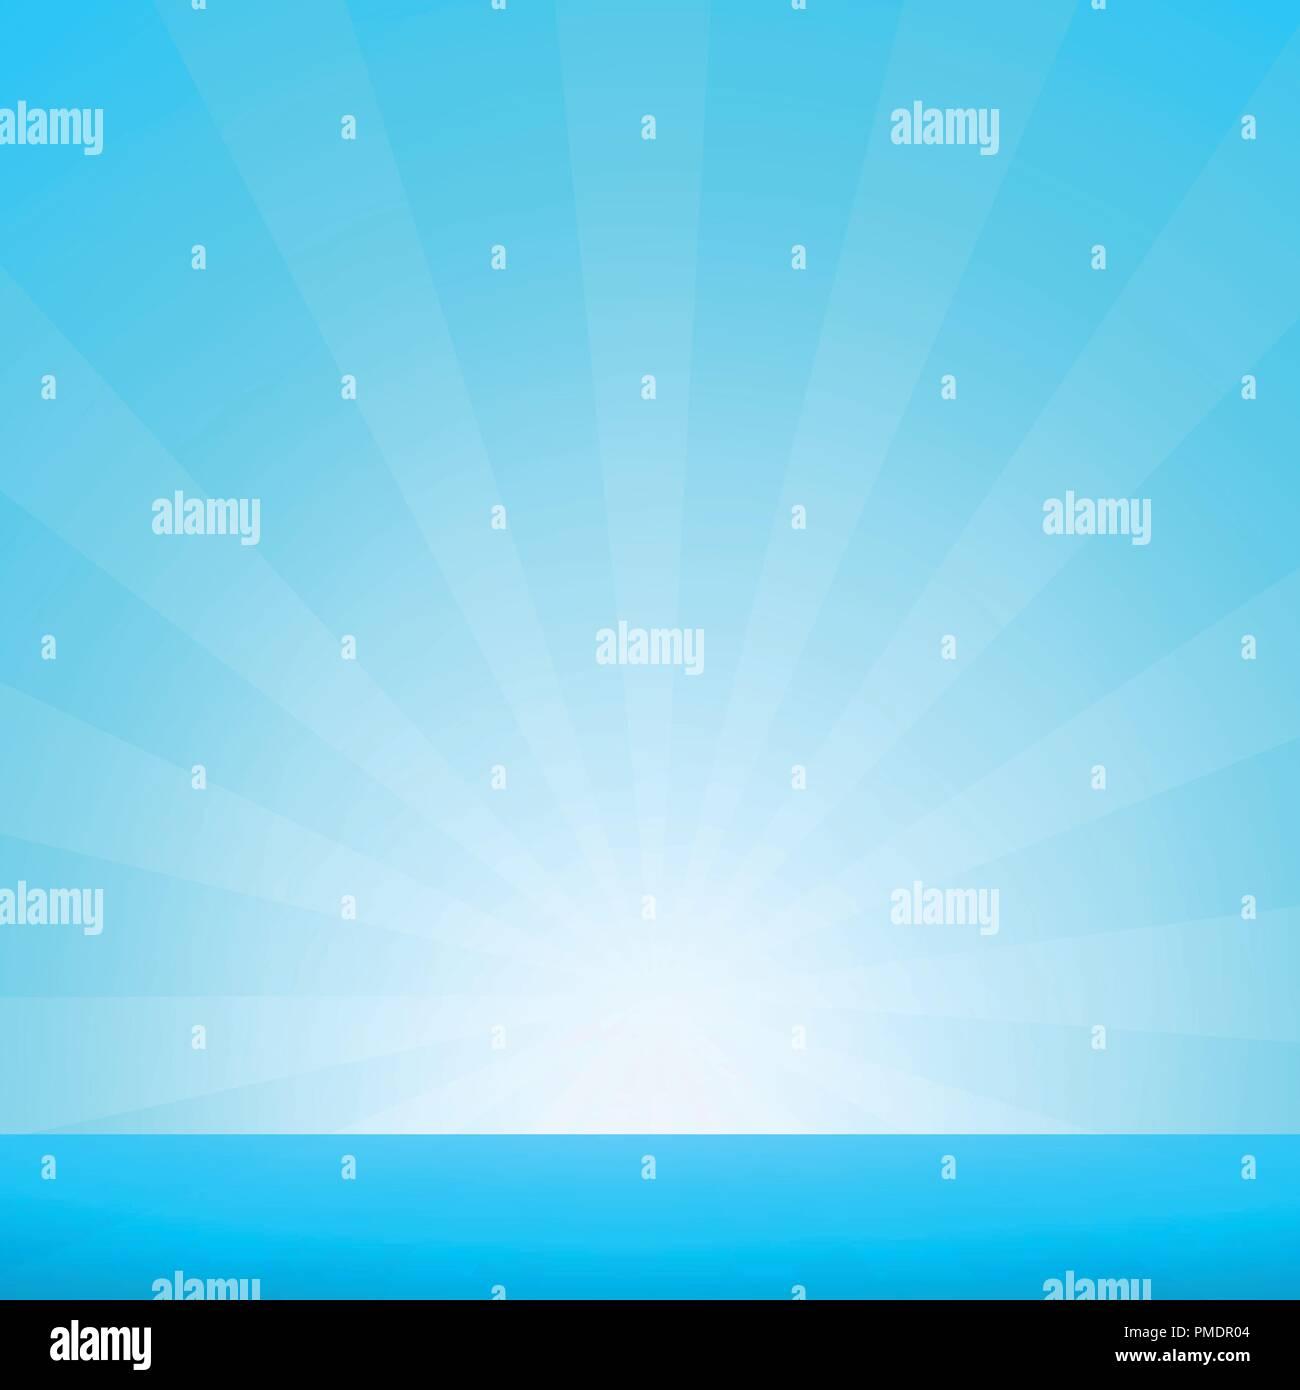 Nautical Marine Landscape with Sunburst and Blue Sea Horizon. Vector Illustration in EPS 10. - Stock Vector